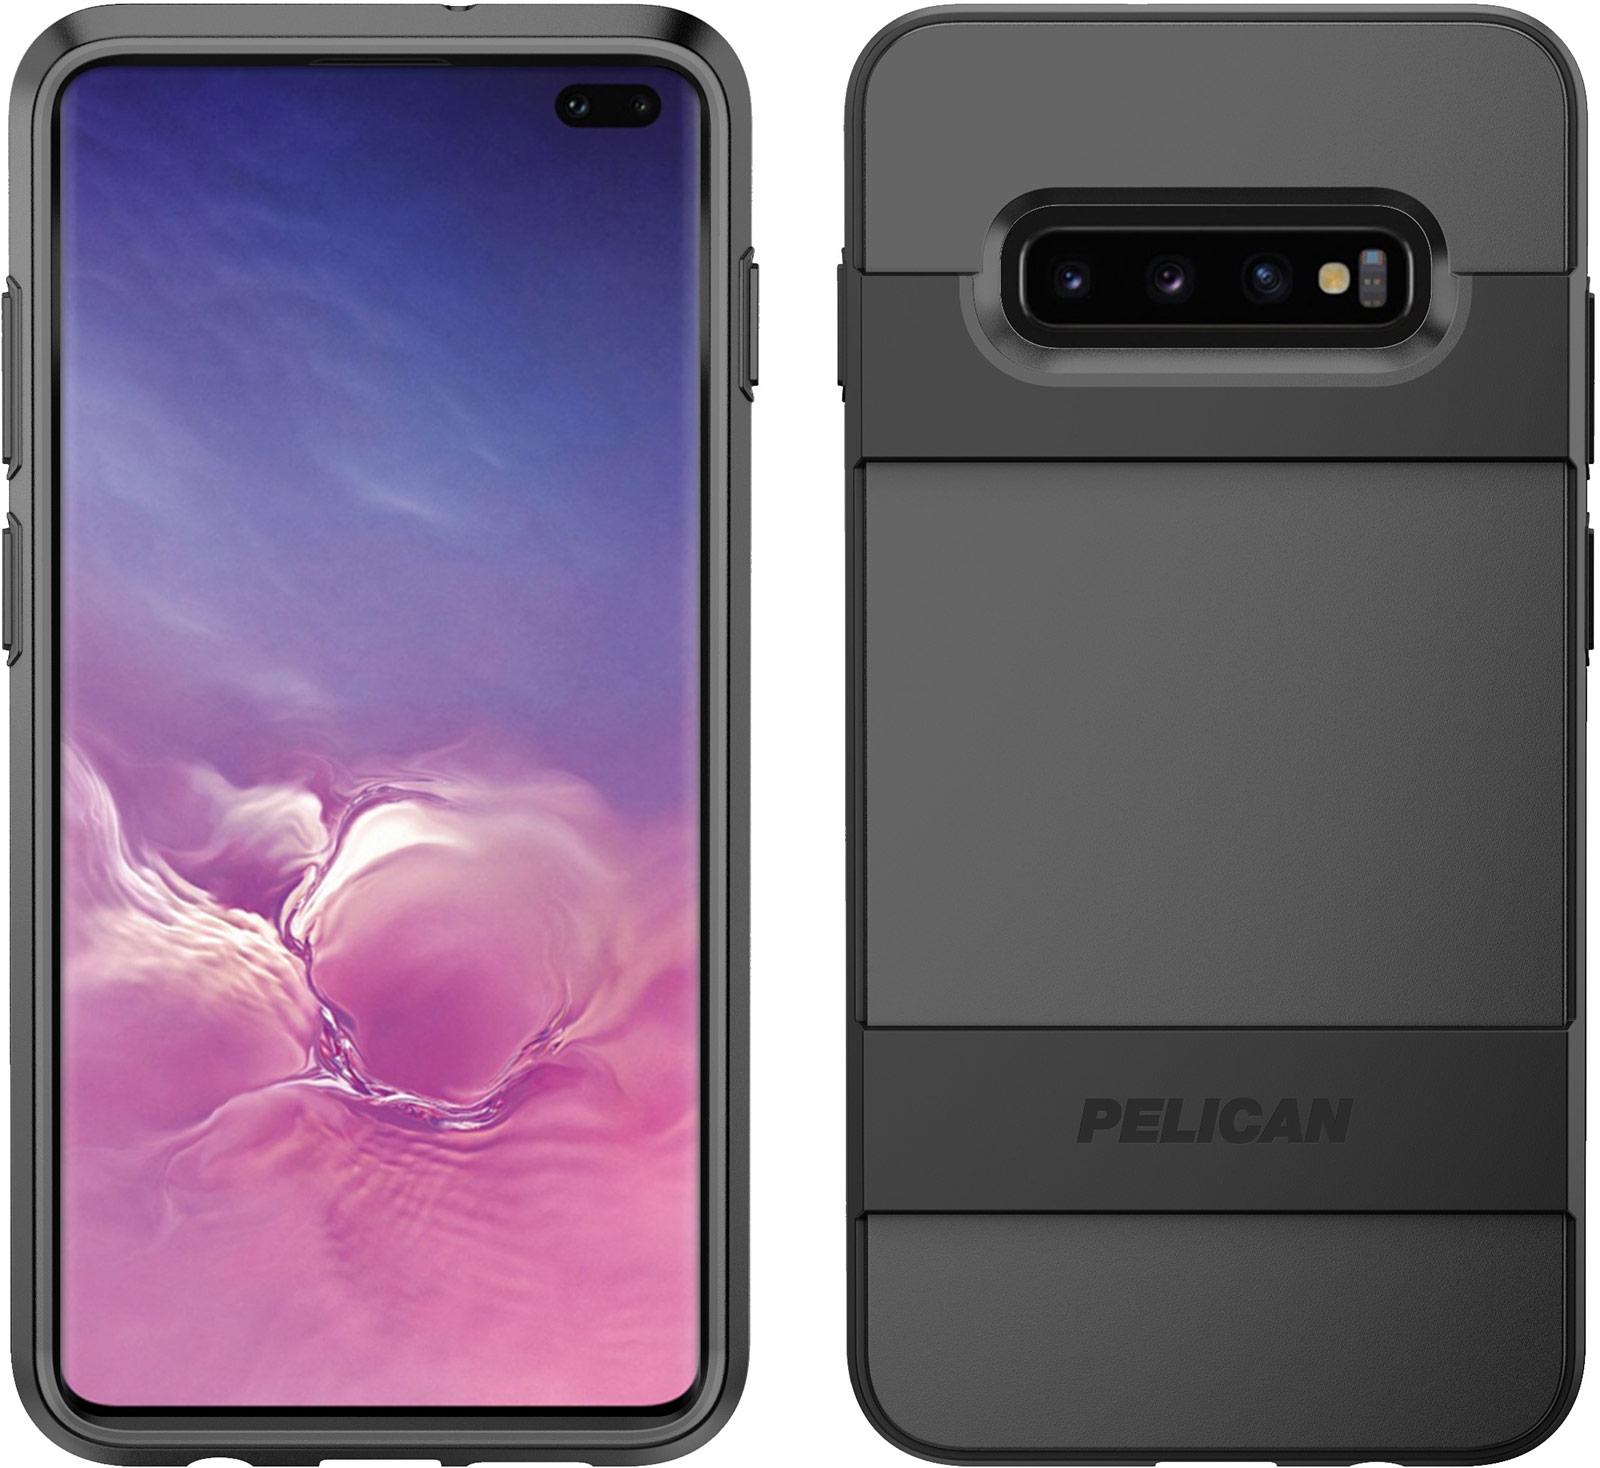 pelican samsung galaxy s10 plus black voyager phone case